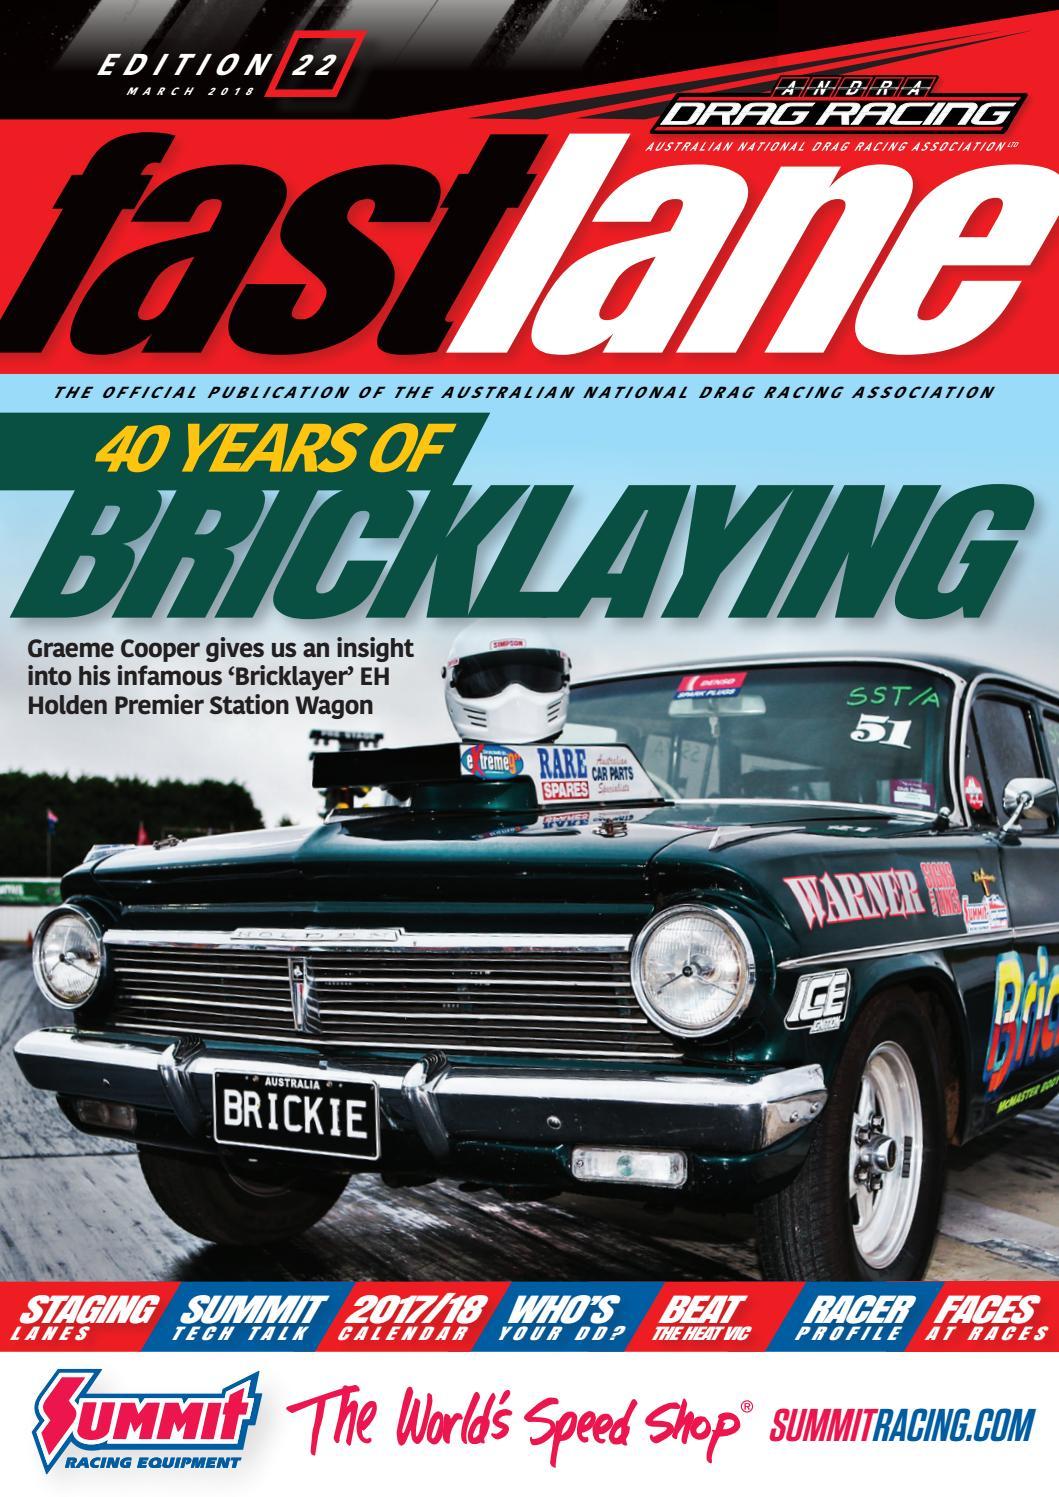 Fastlane Magazine  Issue 22 By Andra Drag Racing  Issuu pertaining to Benaraby Raceway Calendar